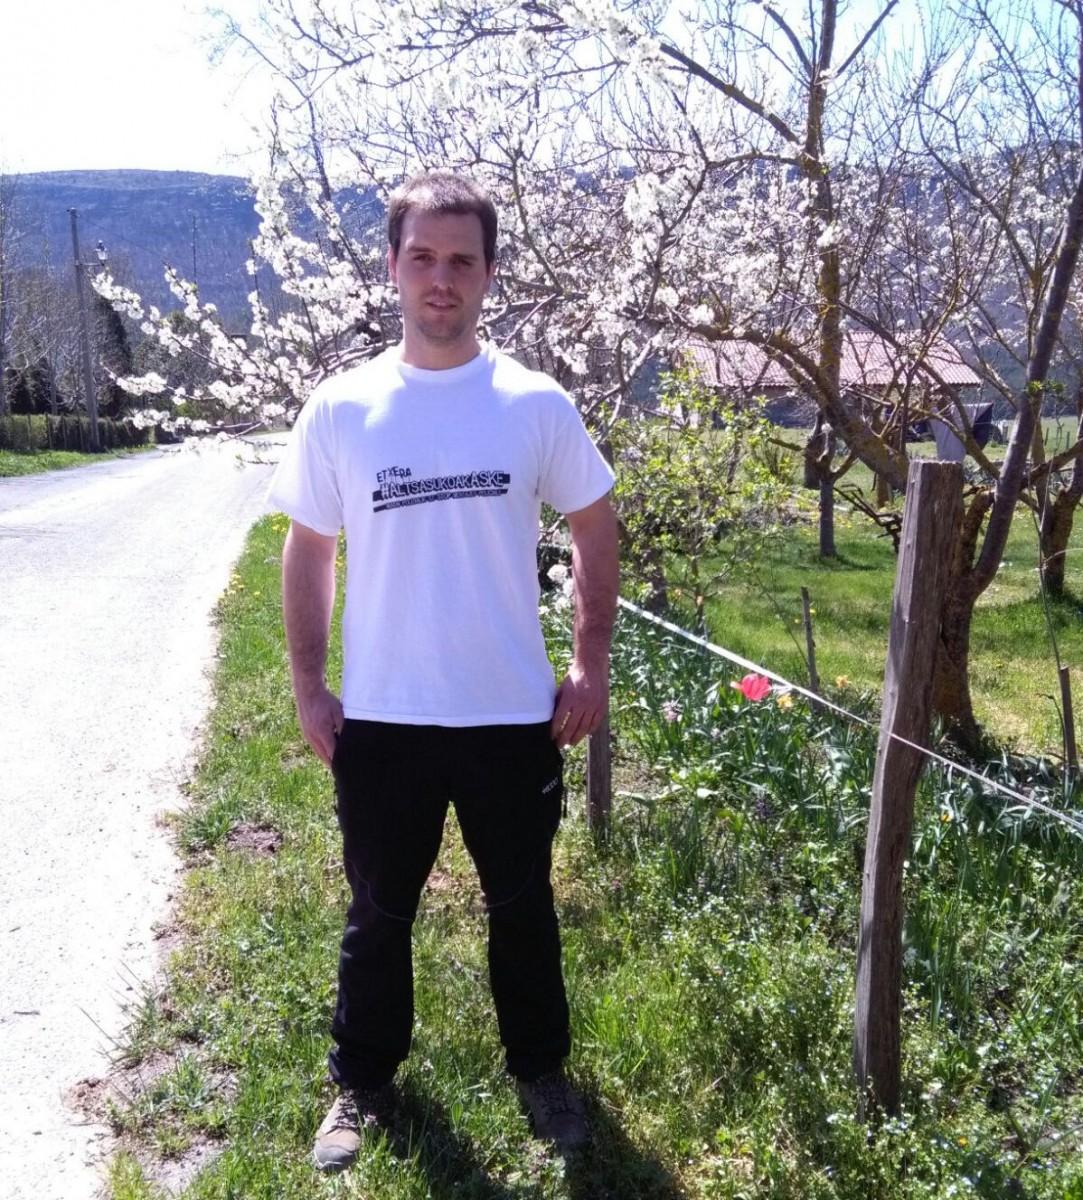 TVE censura a un ganadero de Kuartango que portaba la camiseta de 'Altsasukoak Aske'